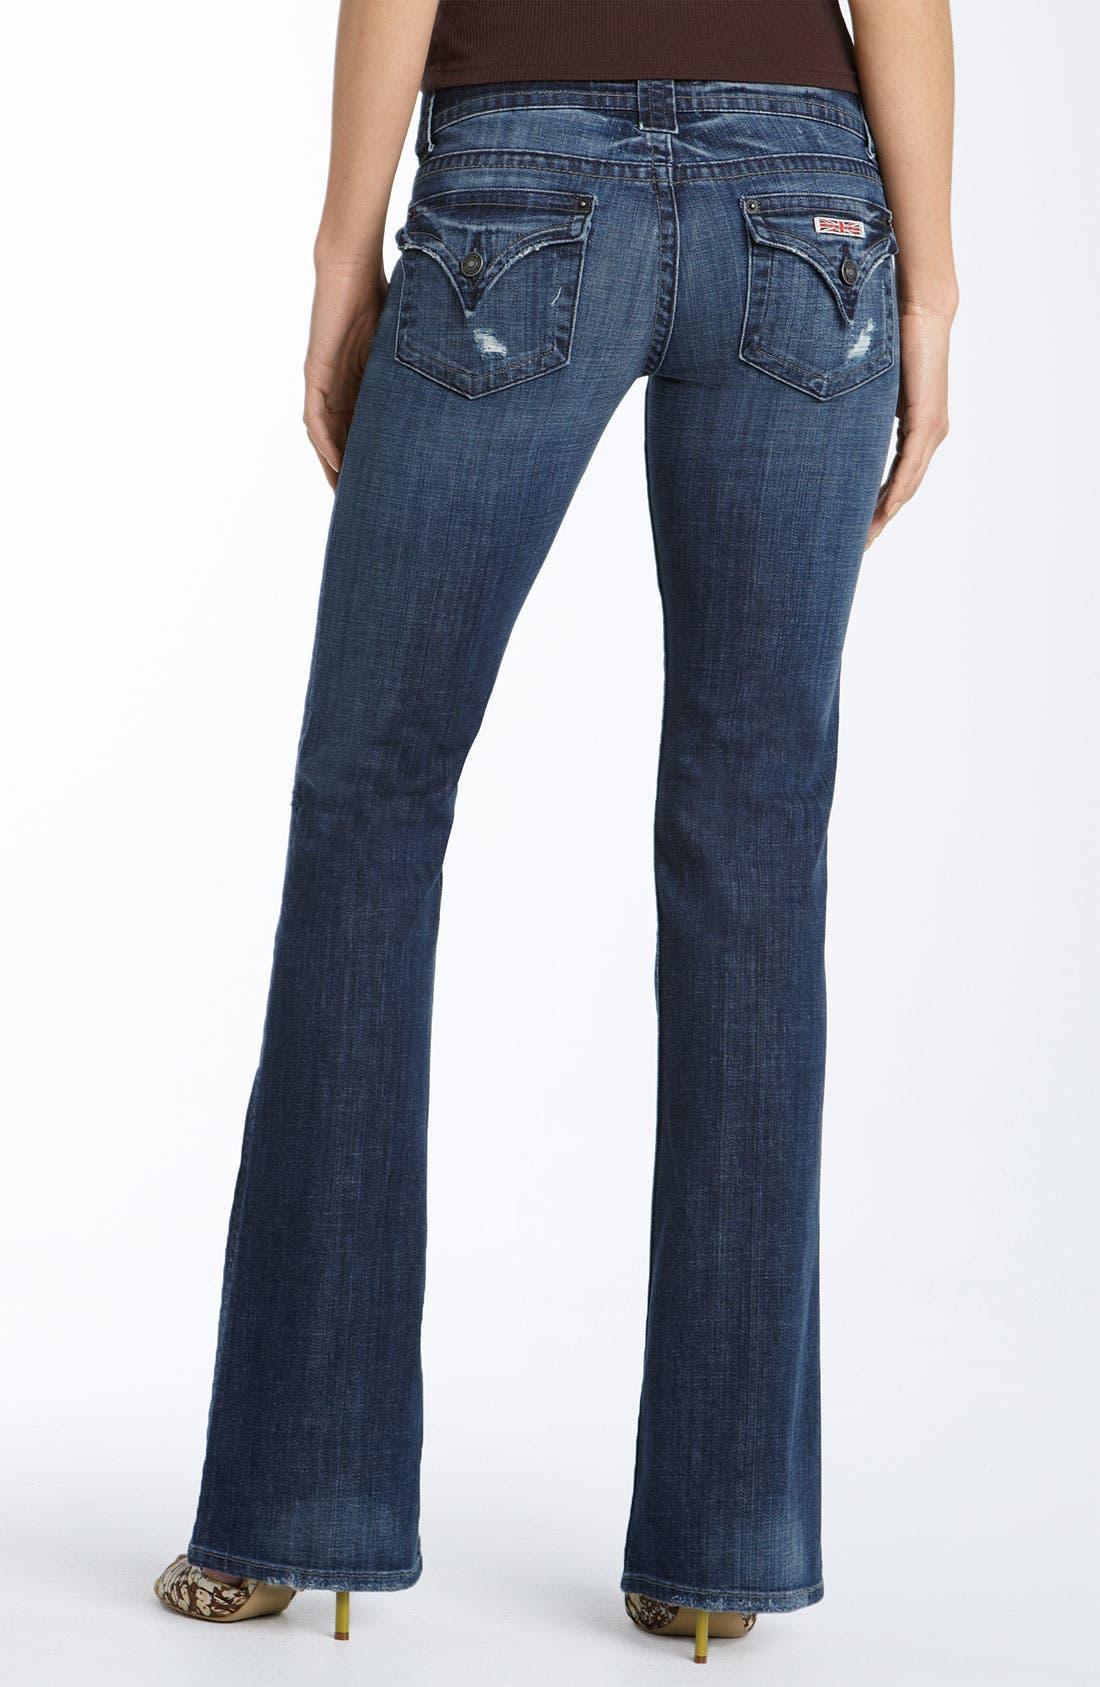 Alternate Image 1 Selected - Hudson Jeans 'Supermodel' Bootcut Stretch Jeans (Sandra Wash) (Long)